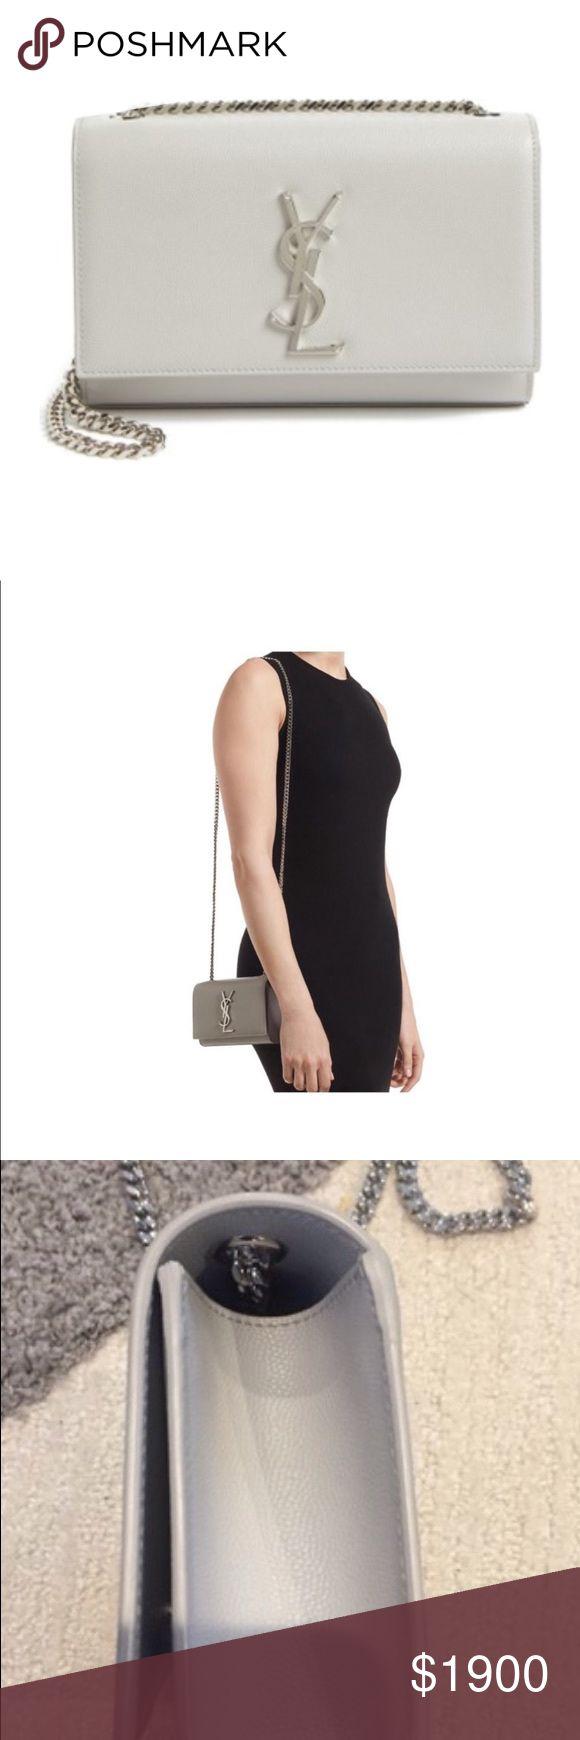 Saint Laurent Classic Kate Monogram leather shoulder bag